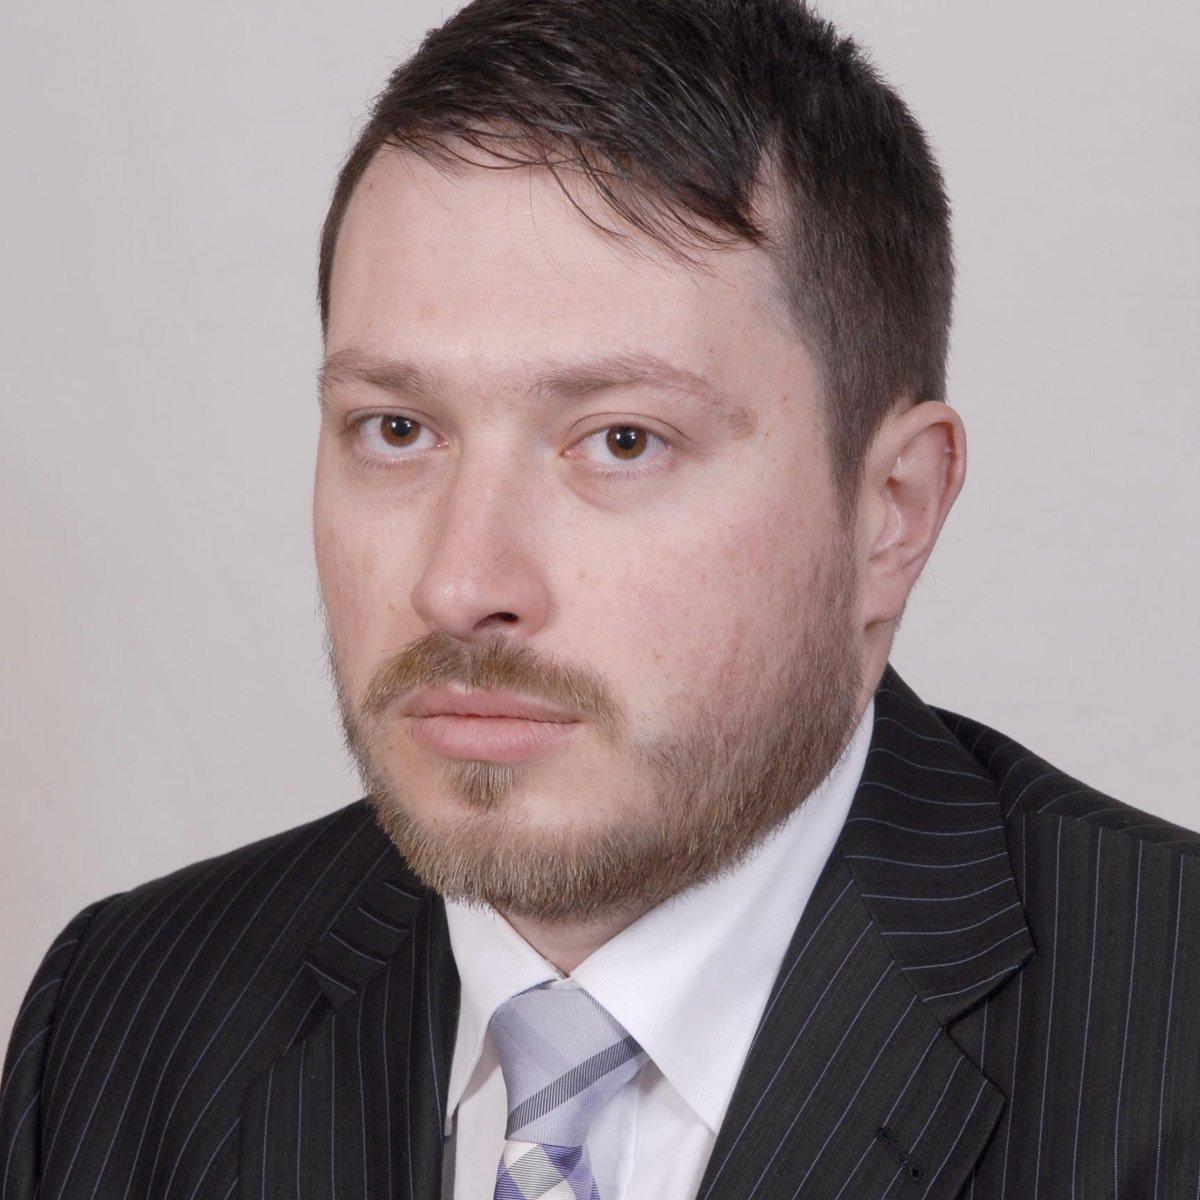 д-р Георги Станулов - гинеколог